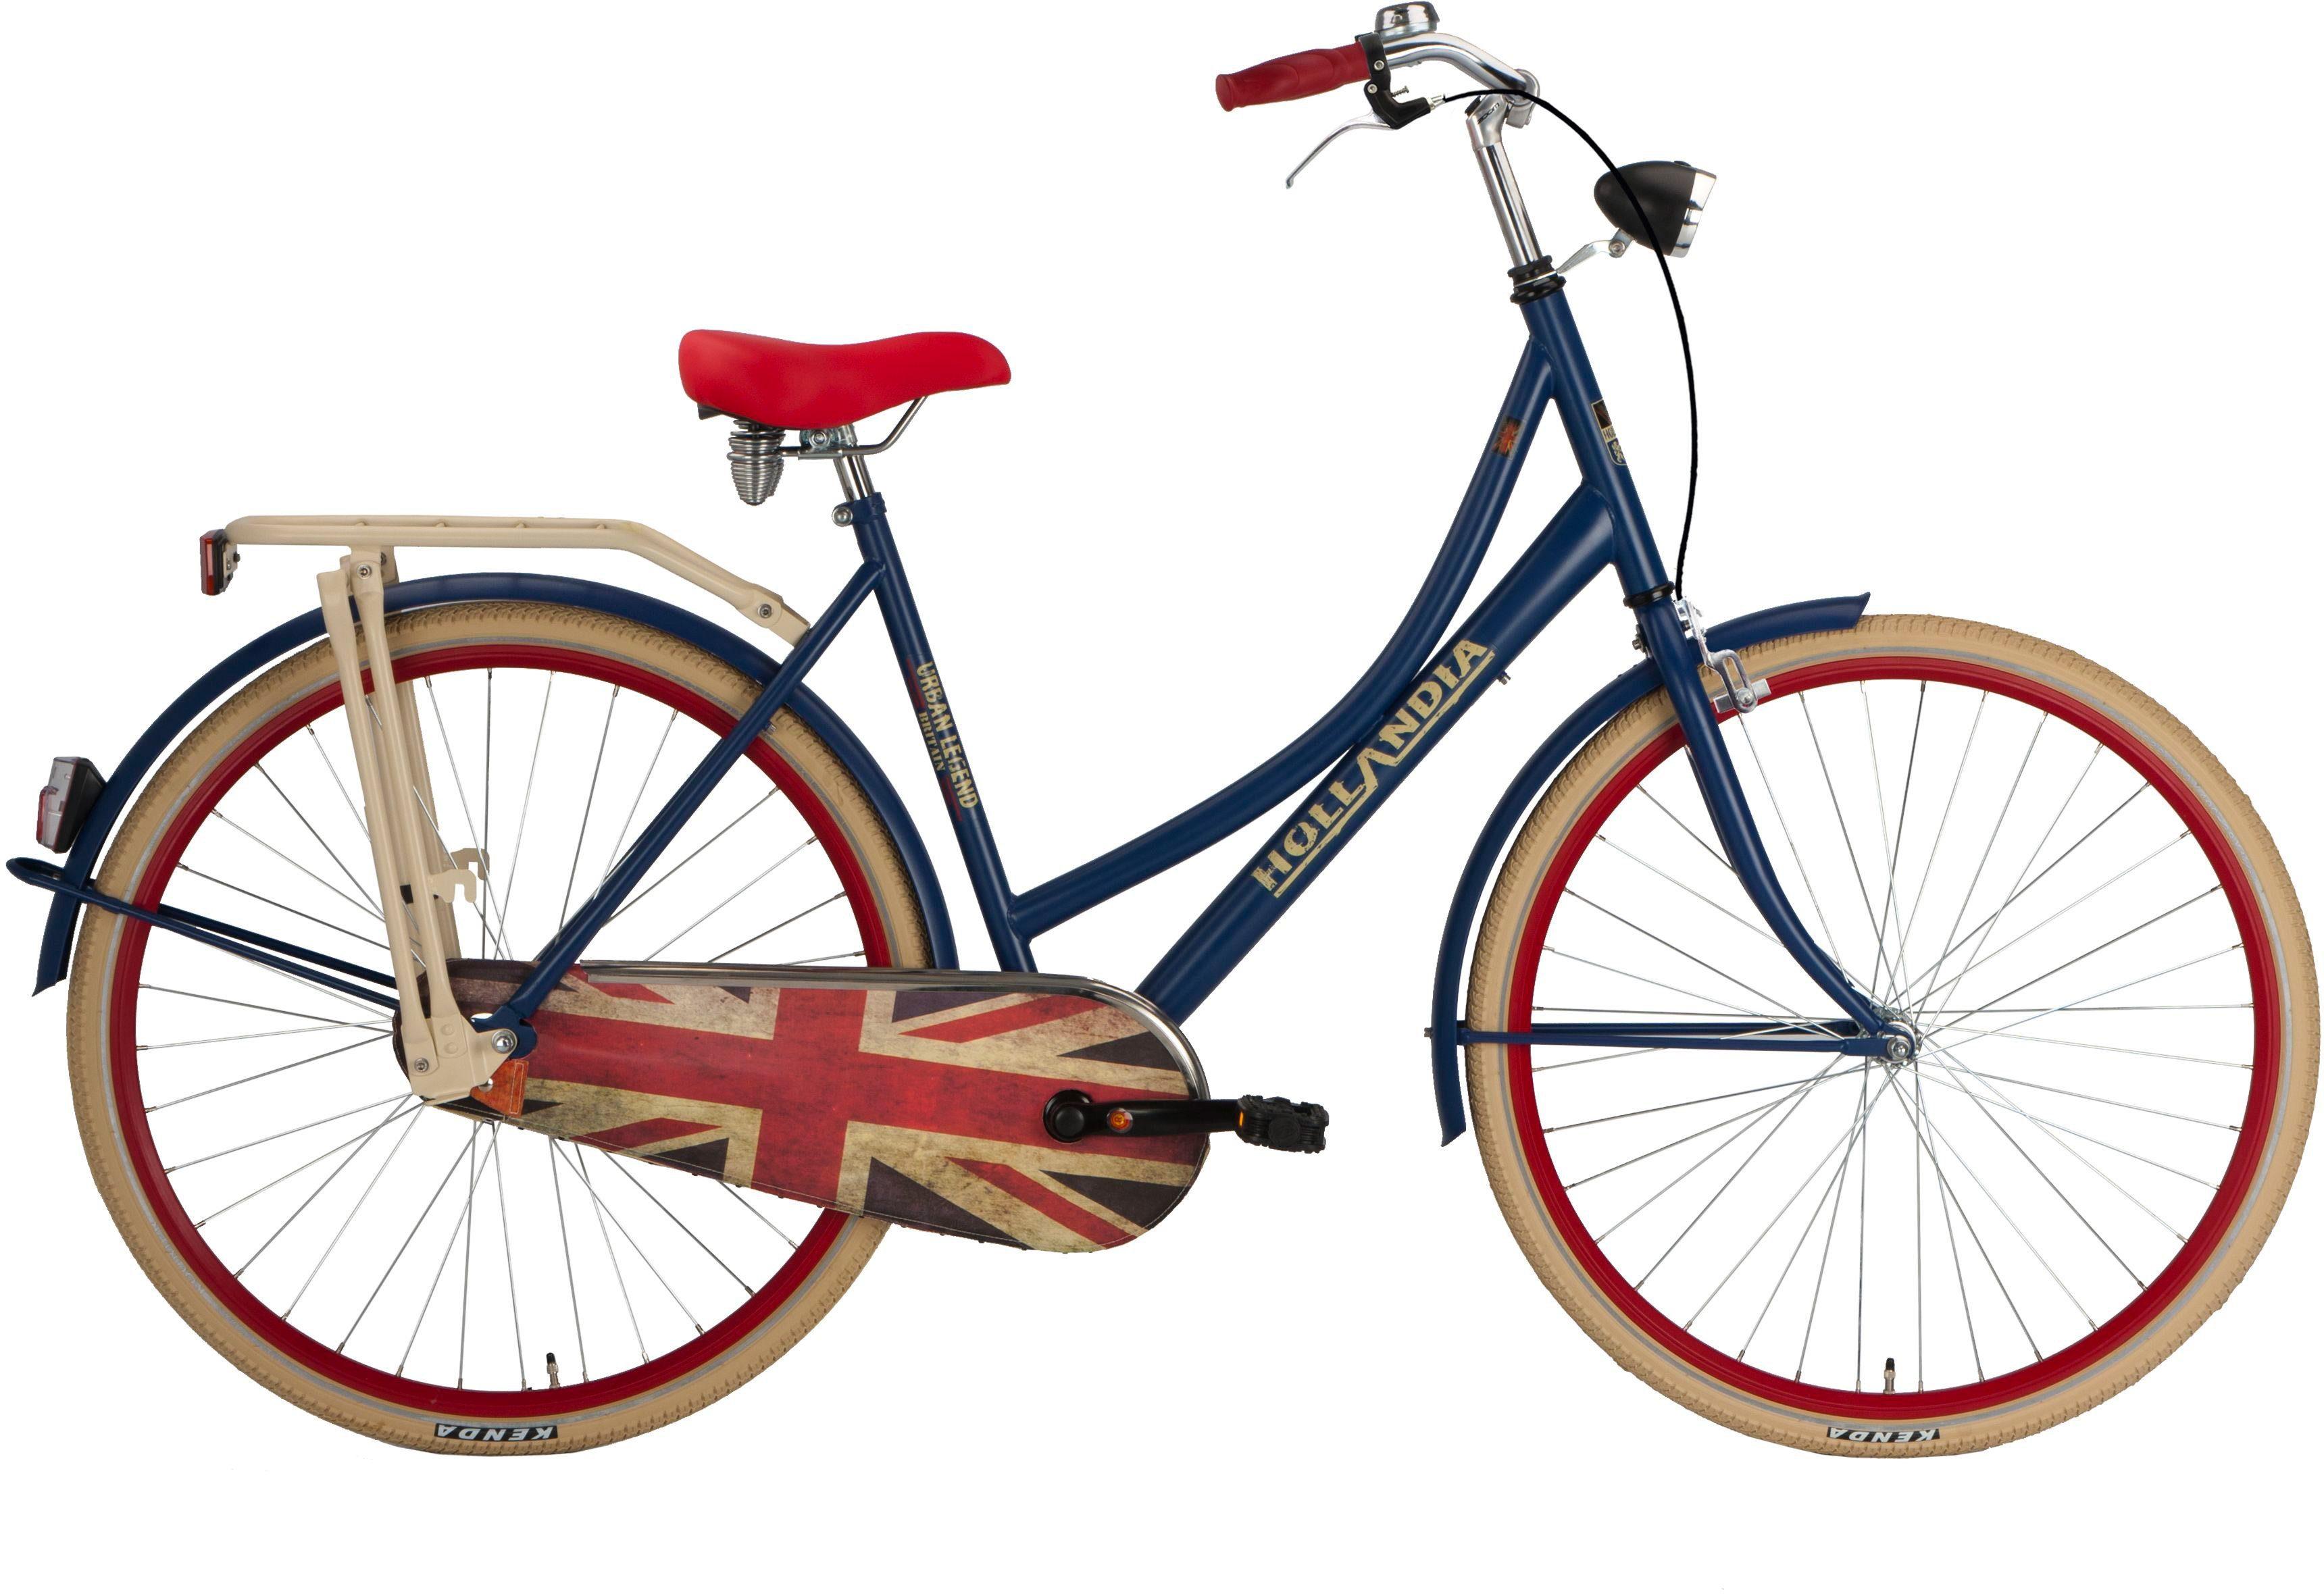 Hollandia Damen Citybike, 28 Zoll, Singlespeed, Rücktritt, »Hollandia goes Britain«